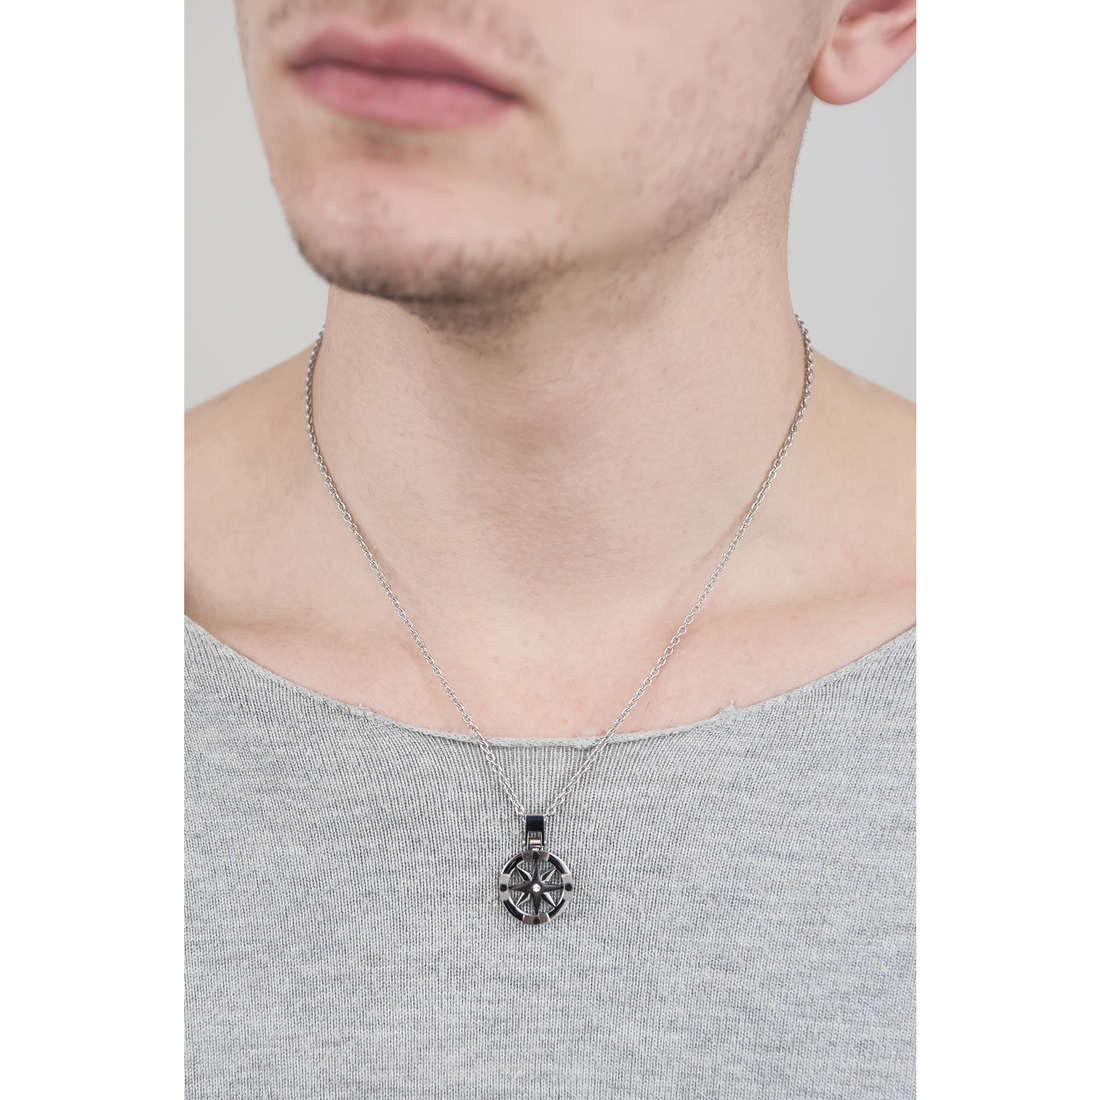 Sector collane Marine uomo SADQ01 indosso